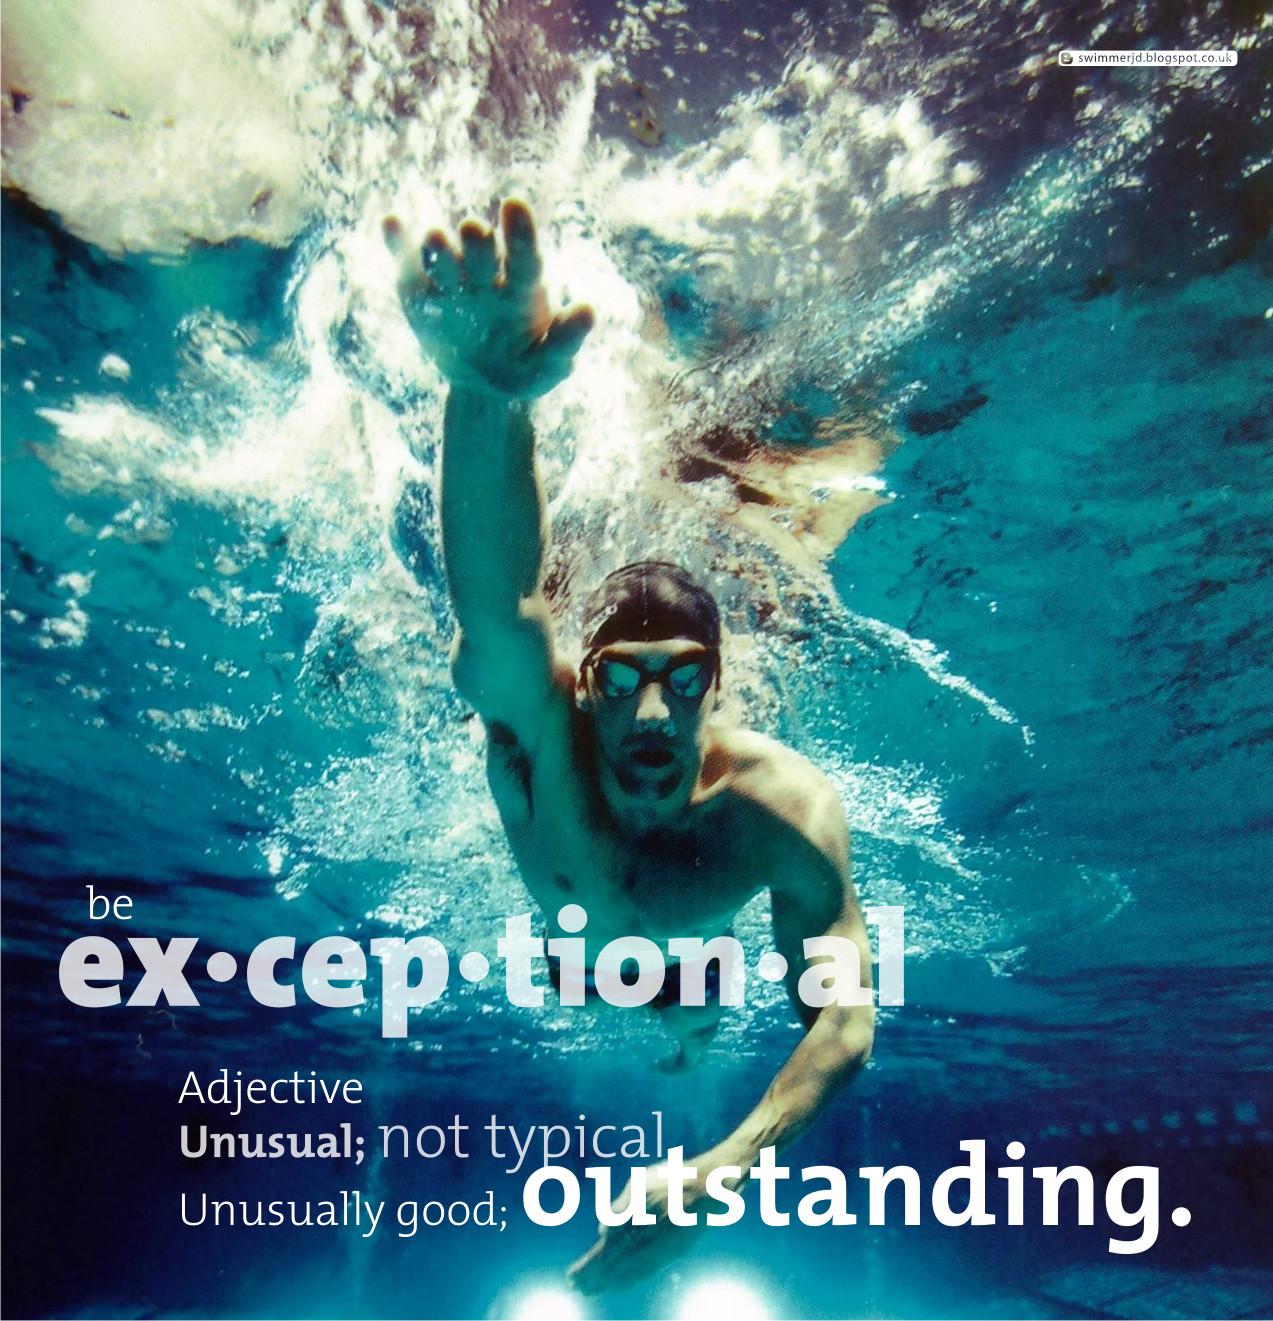 Swimmer James Davies Exceptional Inspiration